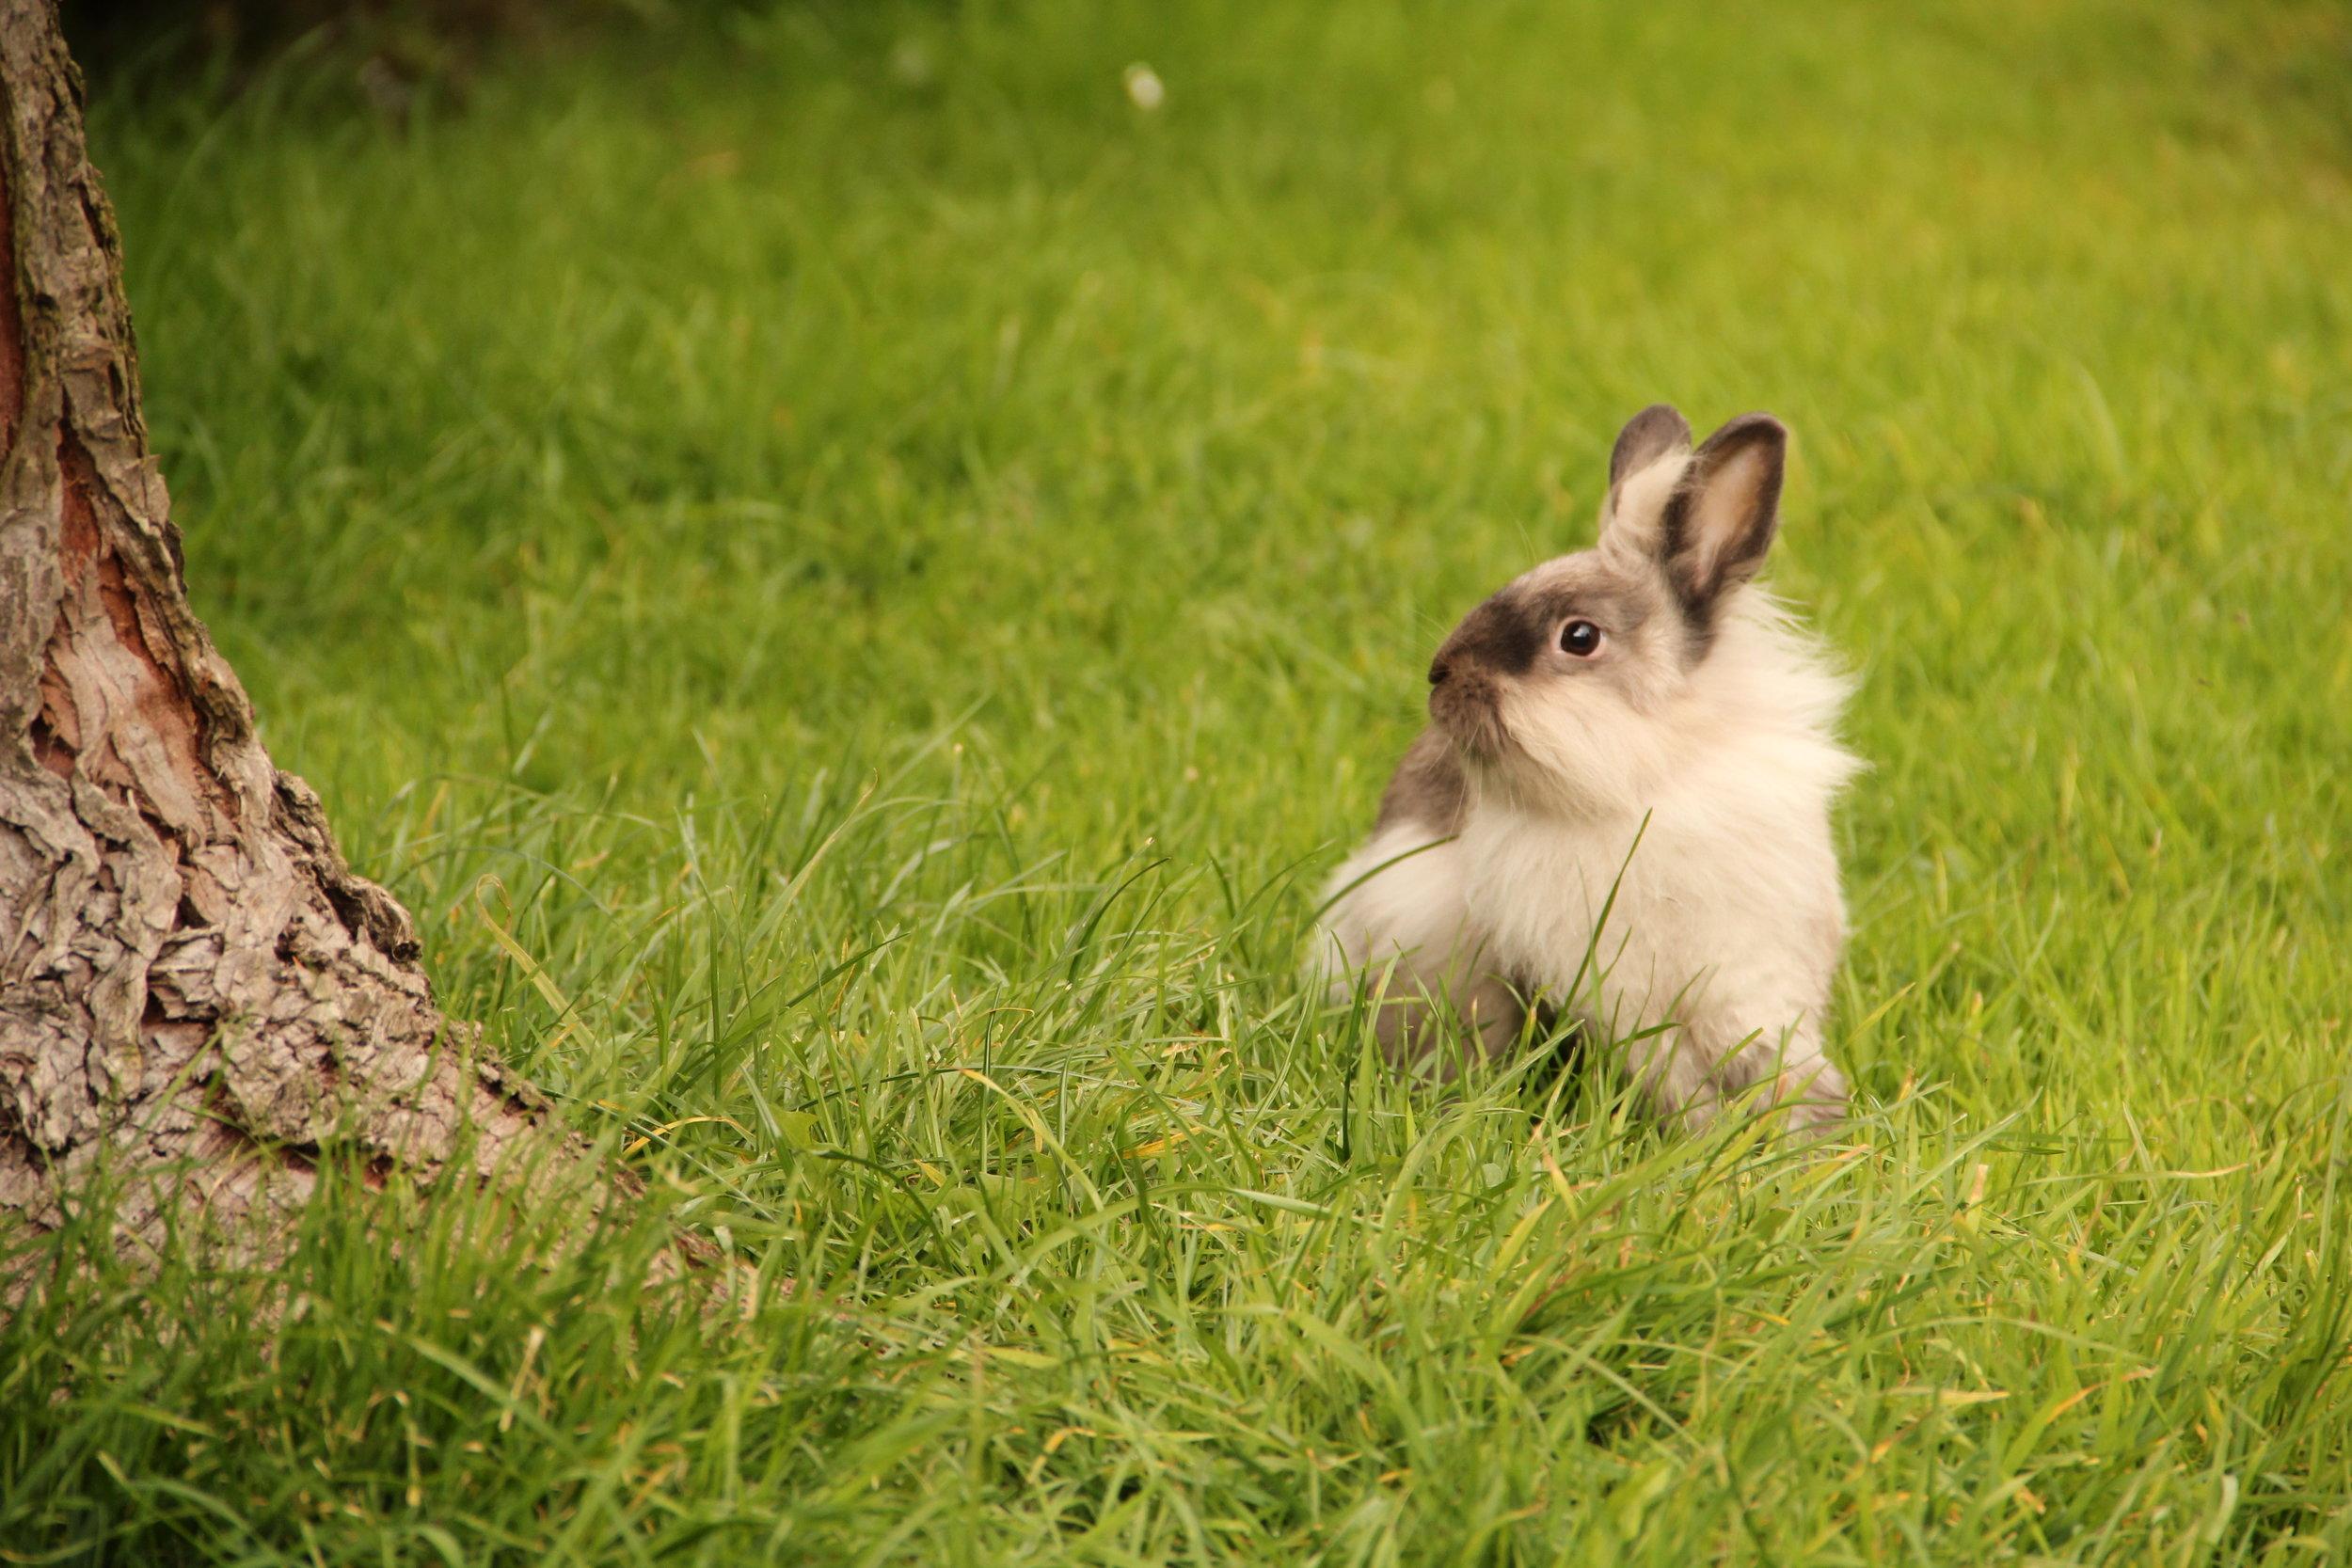 Bunny Coco Poses Like Her Namesake